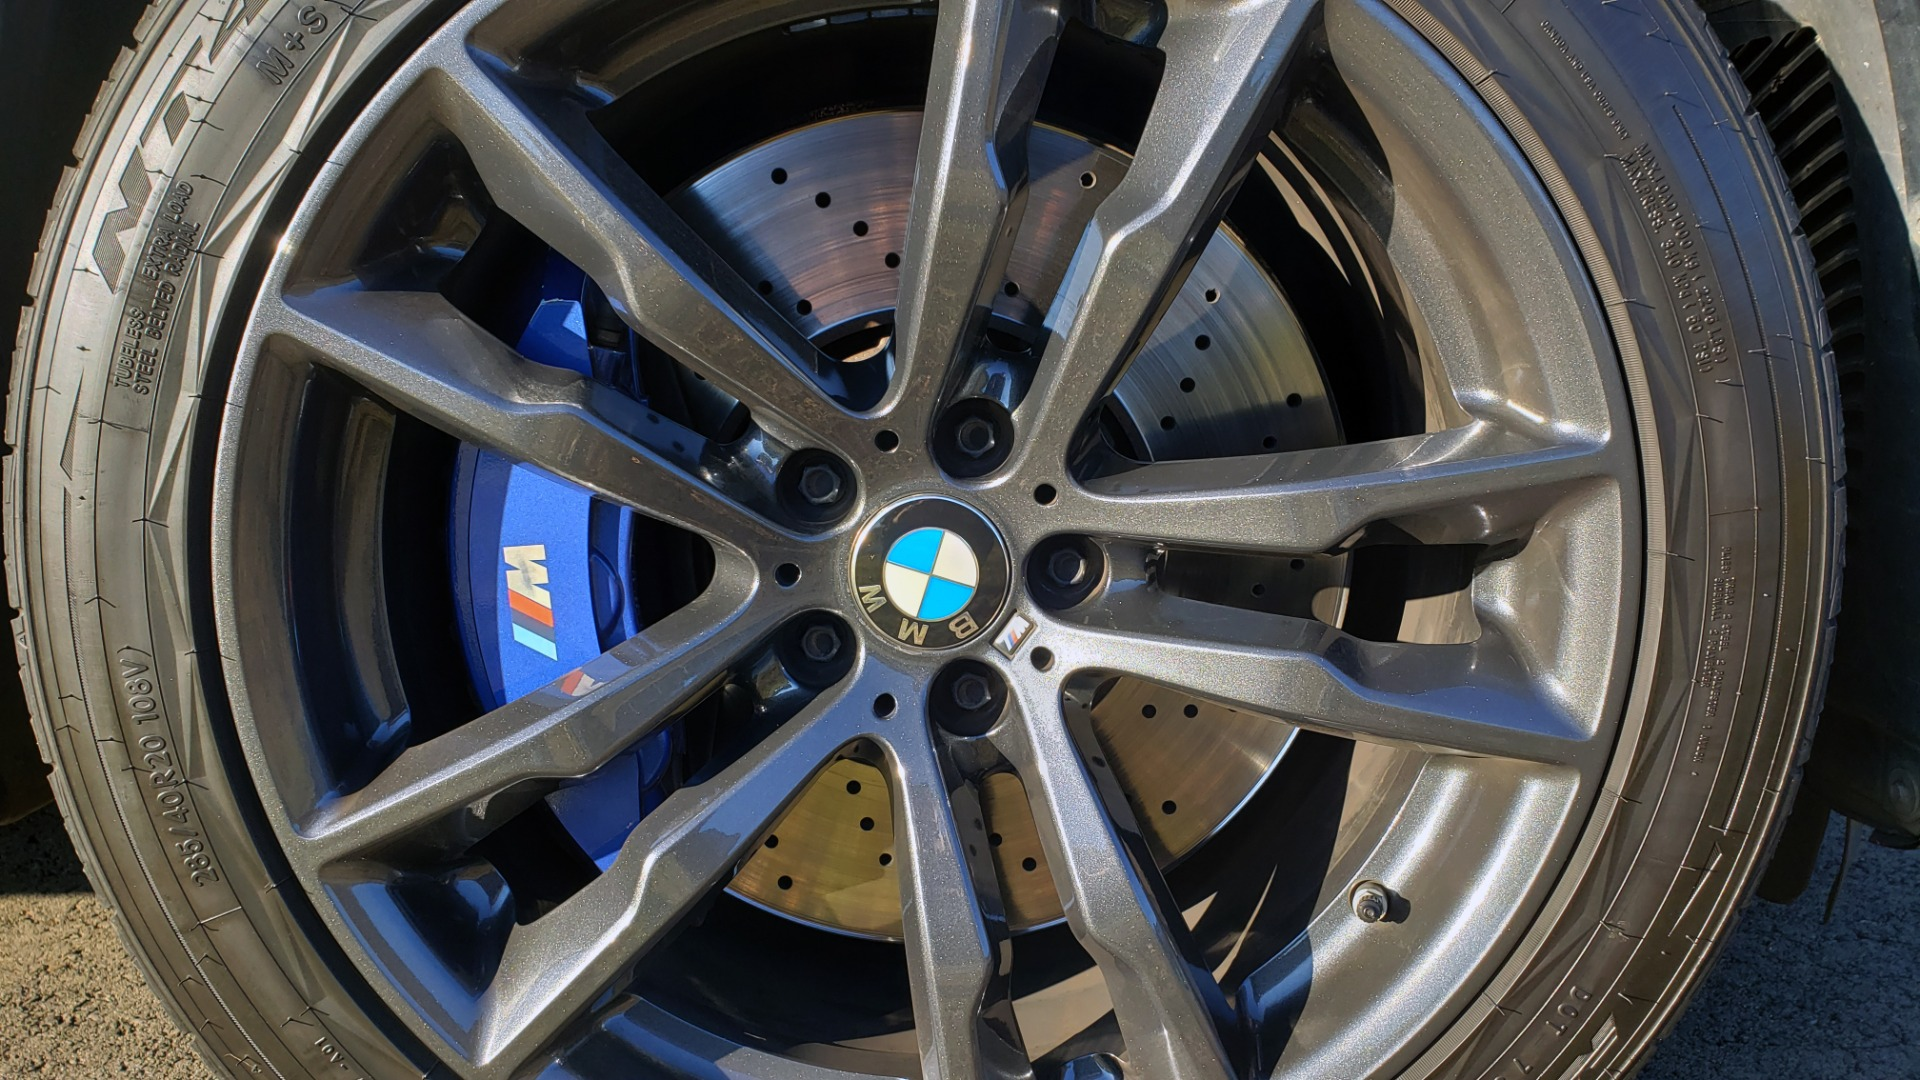 Used 2016 BMW X6 M EXEC PKG / DRVR ASST / NAV / SUNROOF / BLIND SPOT / REARVIEW for sale Sold at Formula Imports in Charlotte NC 28227 96